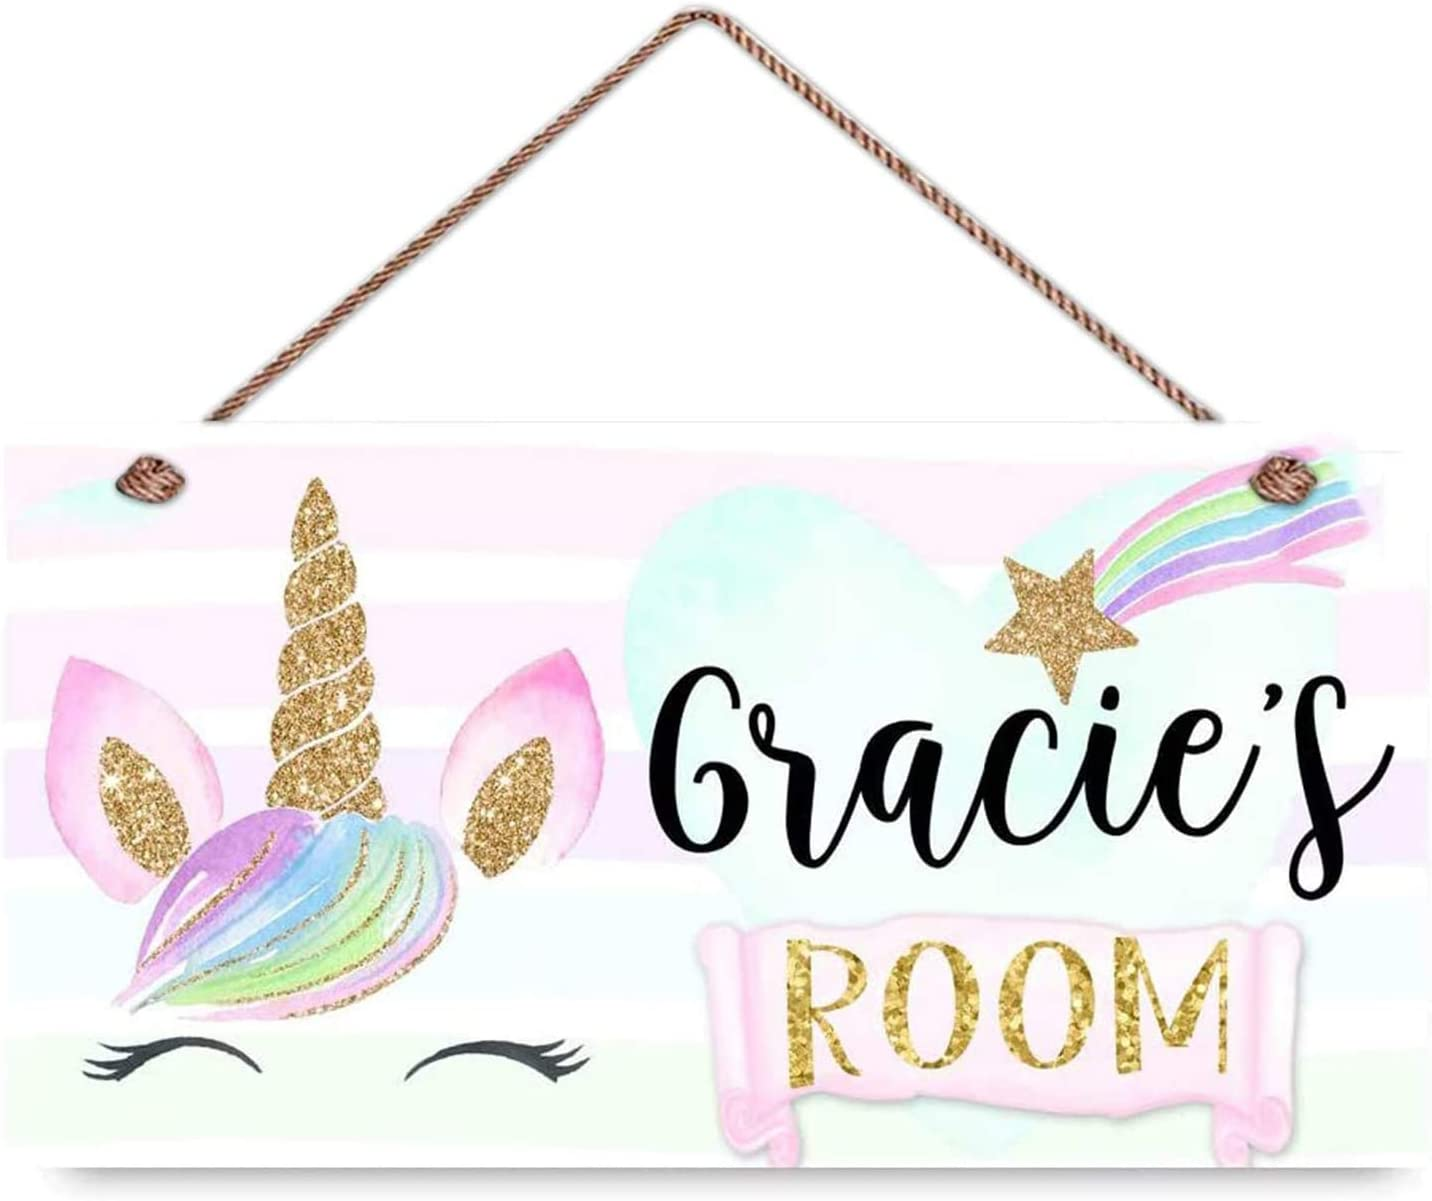 Jinrun Personalise Unicorn Bedroom Decor for Girls, Rainbow Unicorn Room Decor Signs, Door Wall Decor Art Wooden Signs